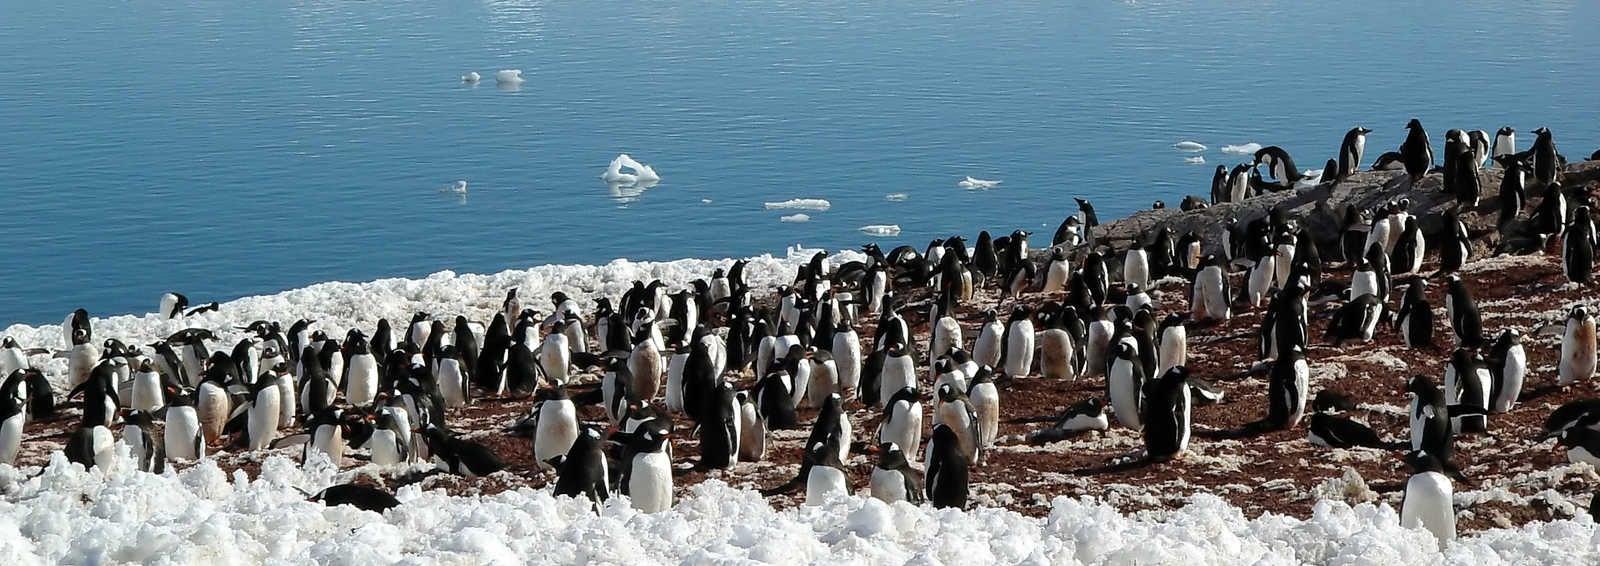 Antarctic penguin group